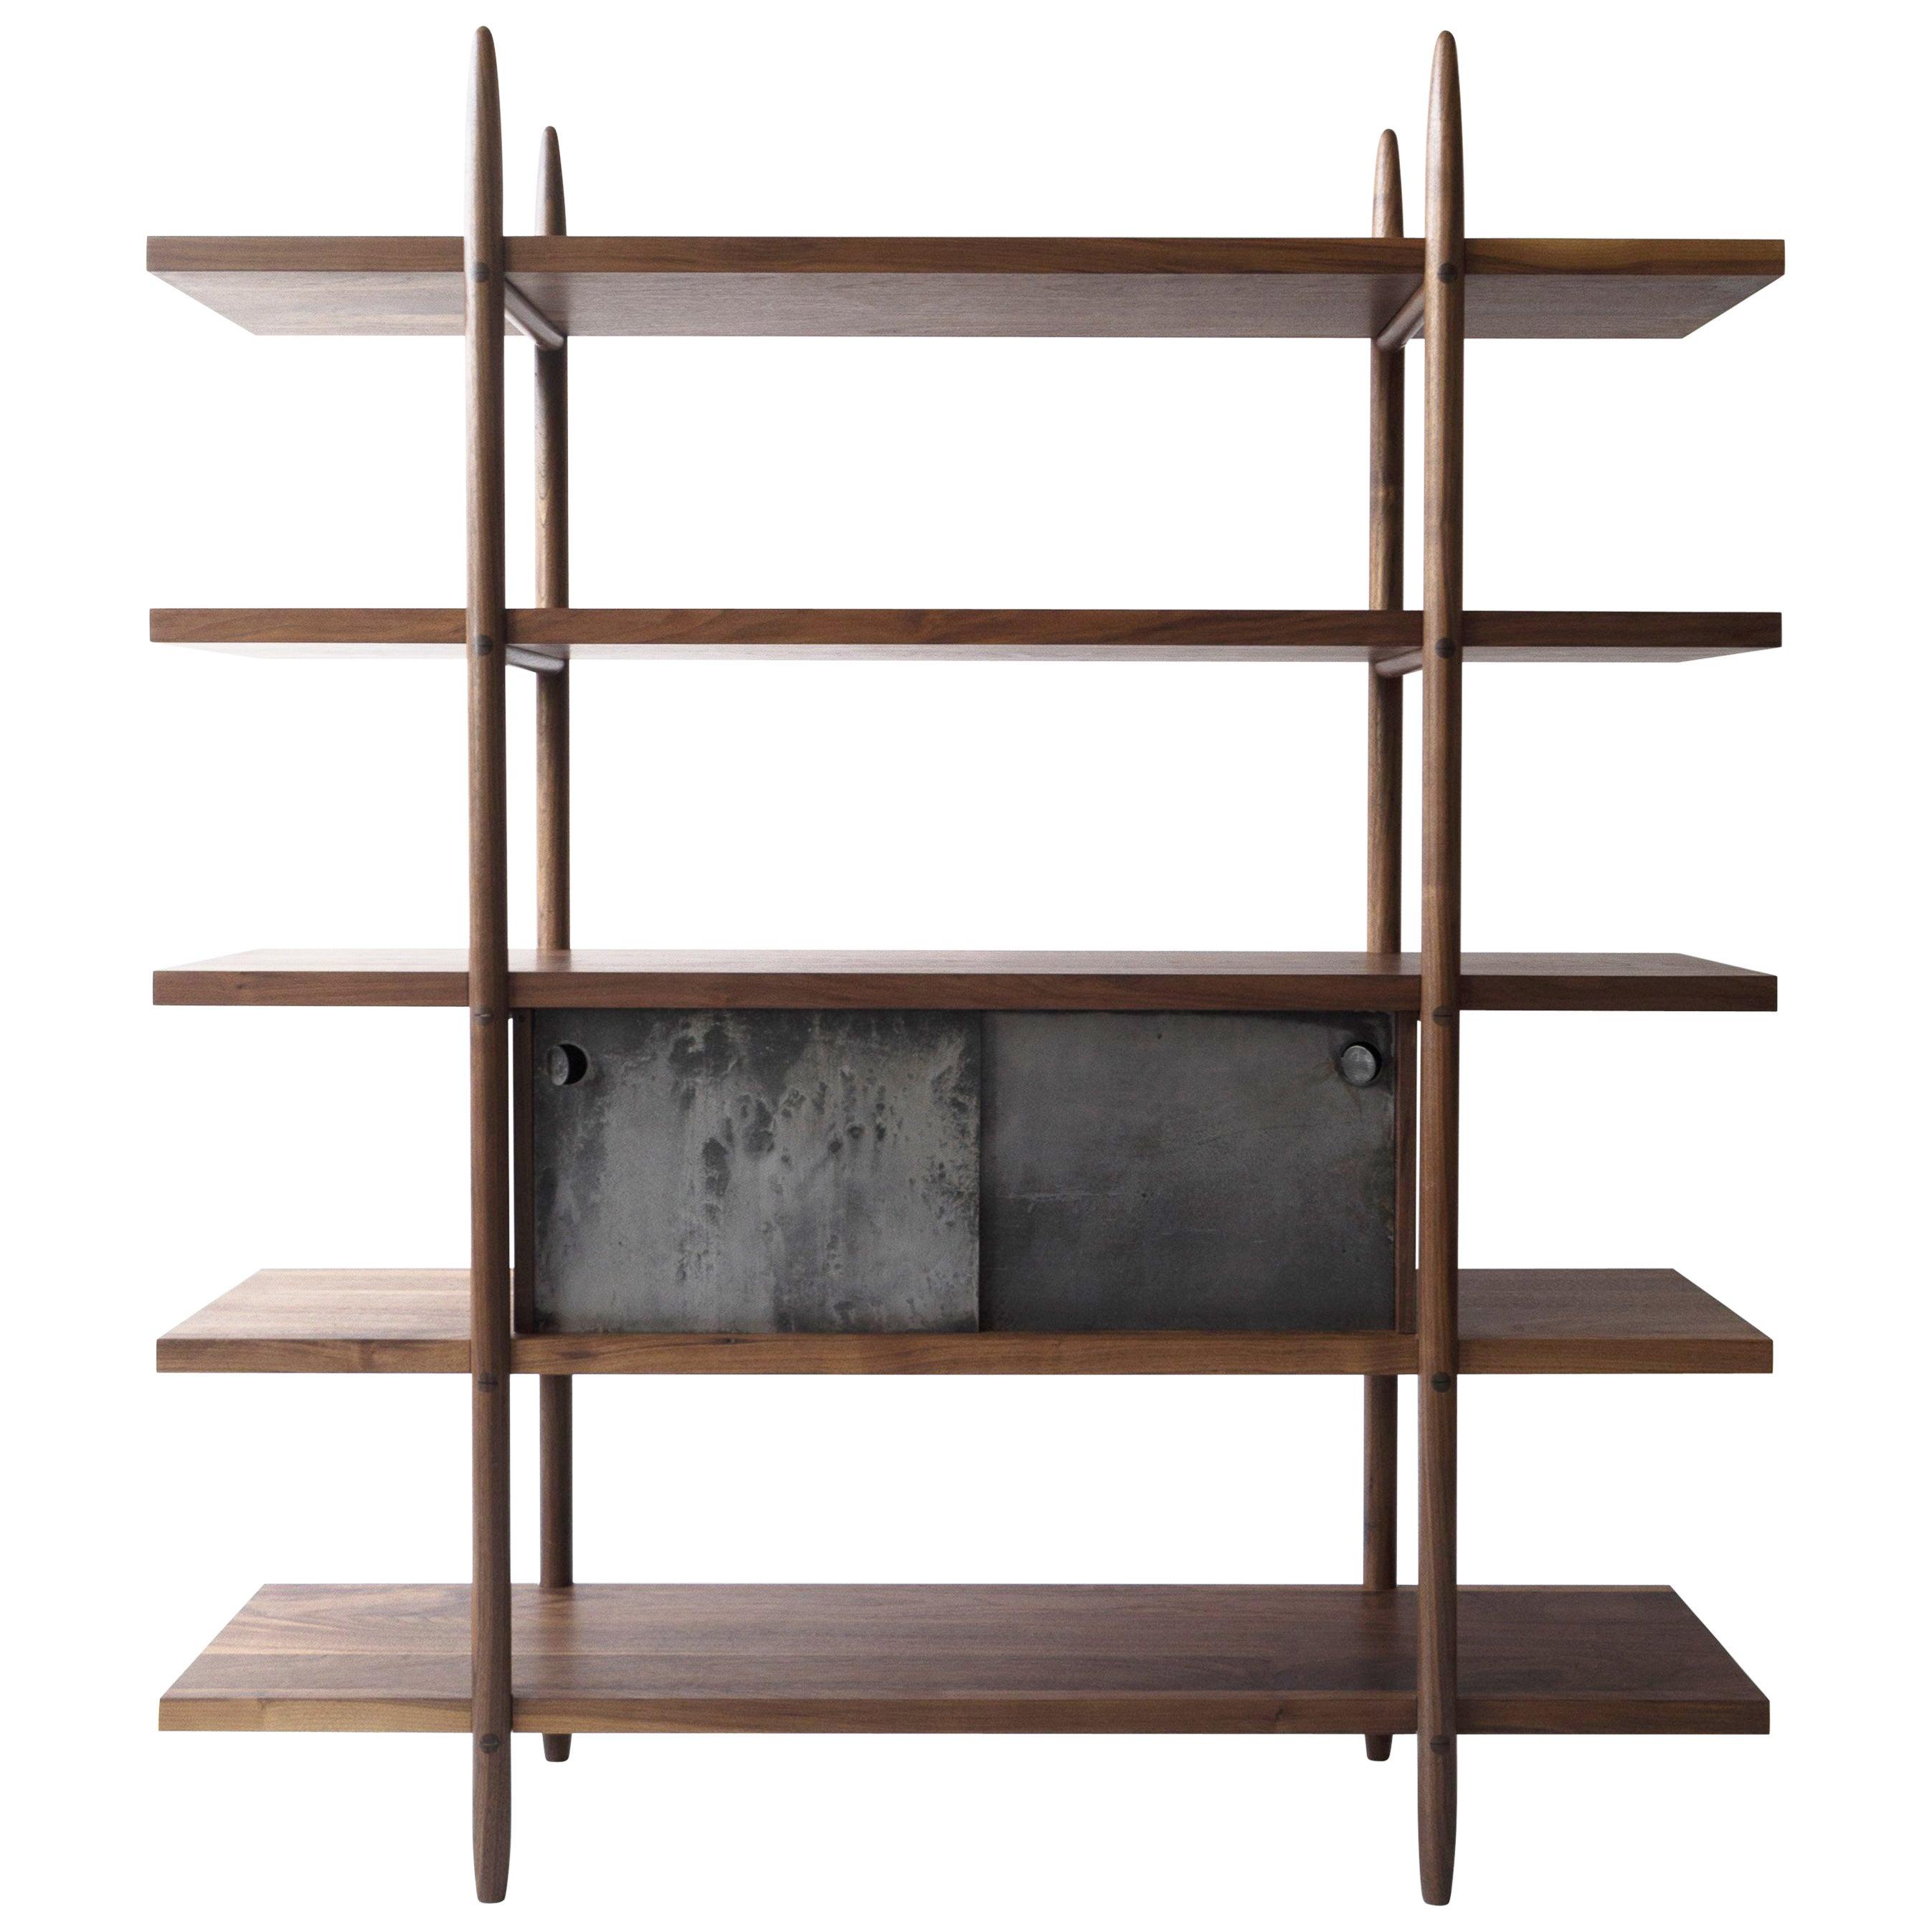 Deepstep Shelving Modular Storage with Fine Wood Detailing by Birnam Wood Studio